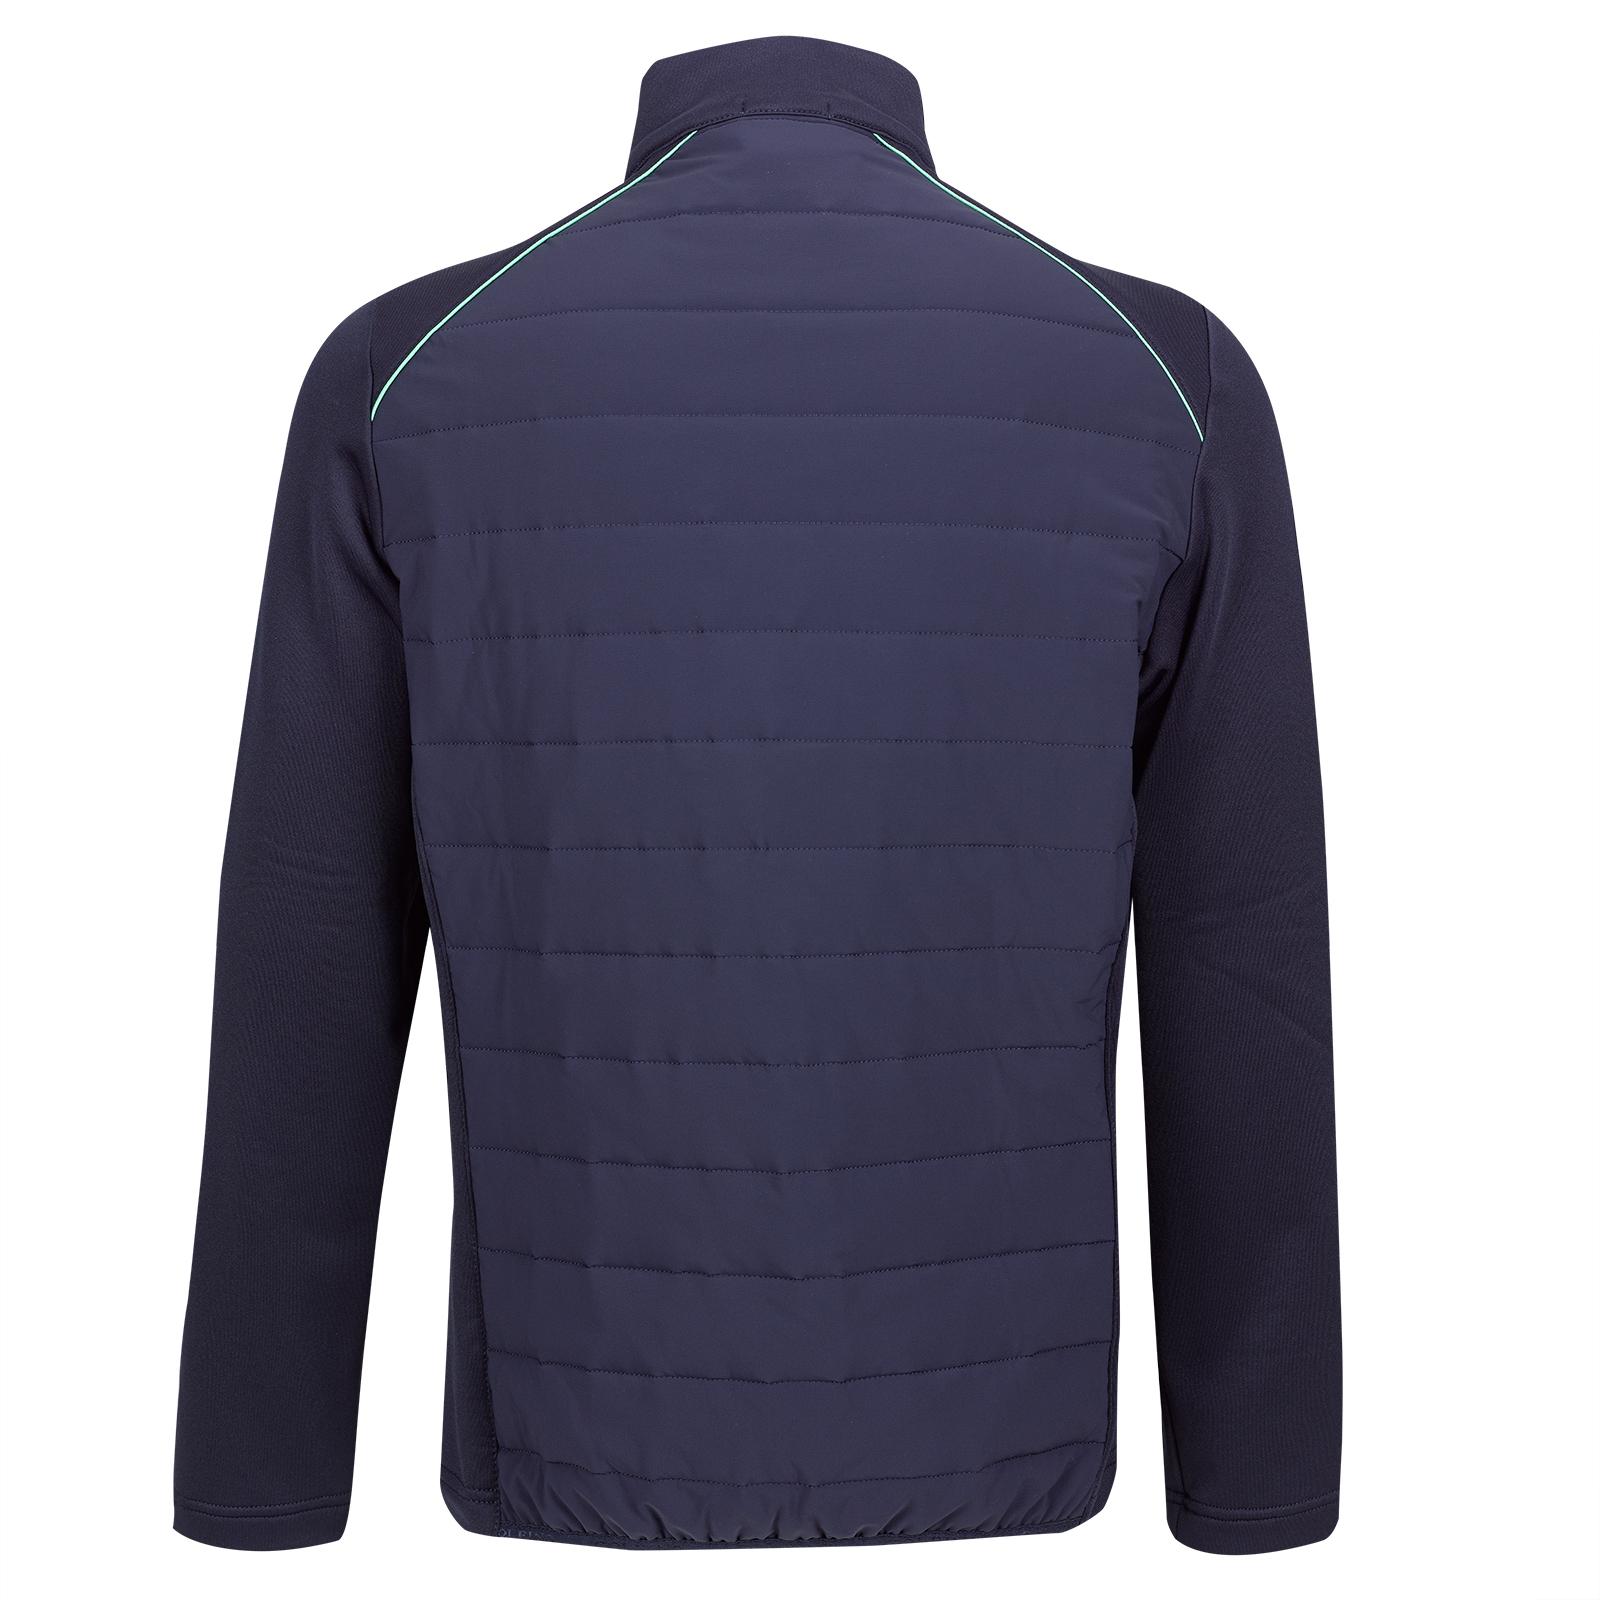 Gesteppte Performance Herren Stretch-Golfjacke Cold Protection